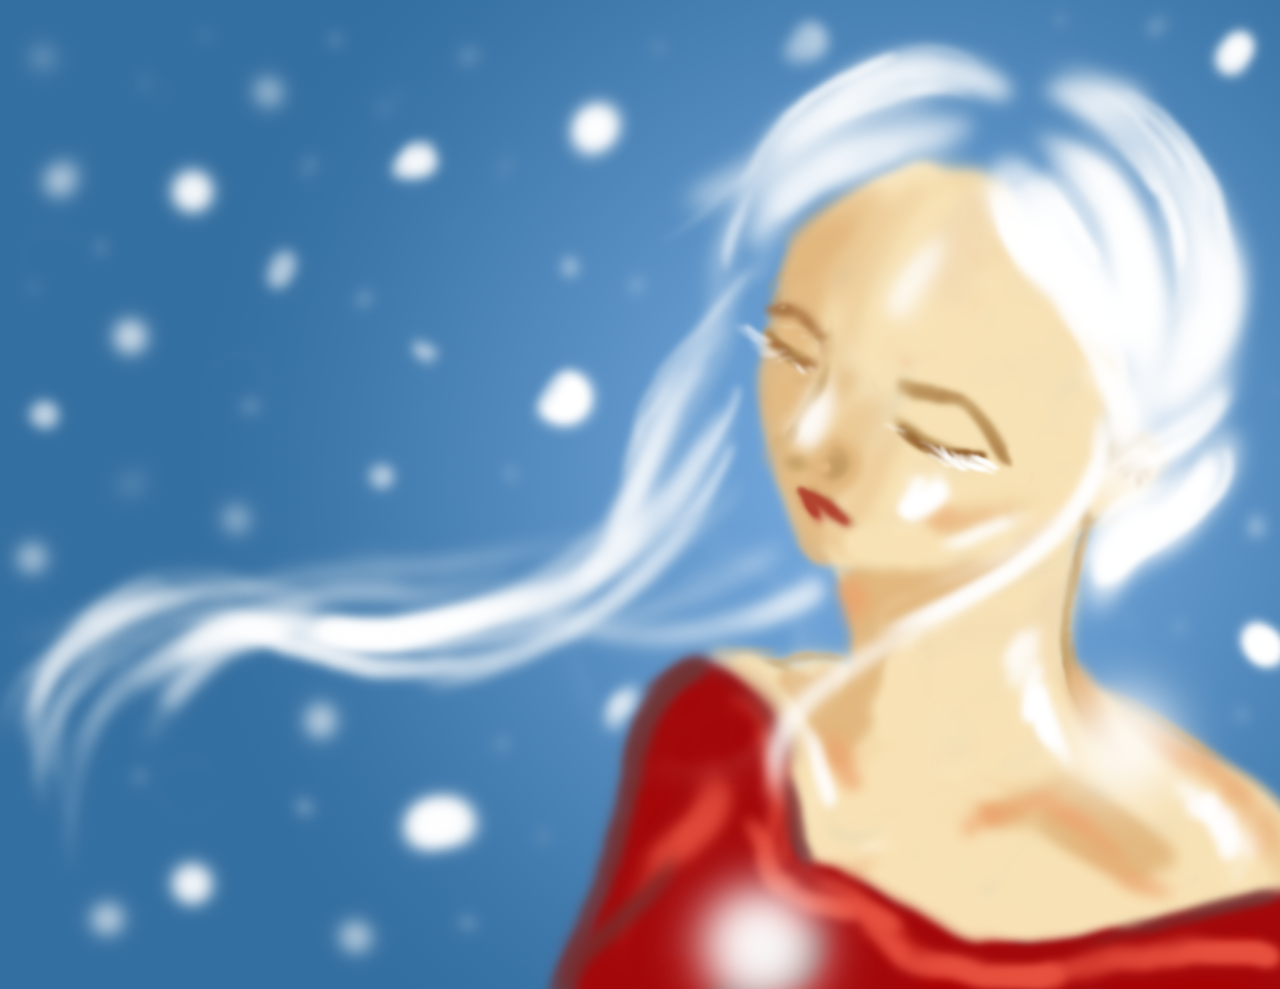 The Snowgirl